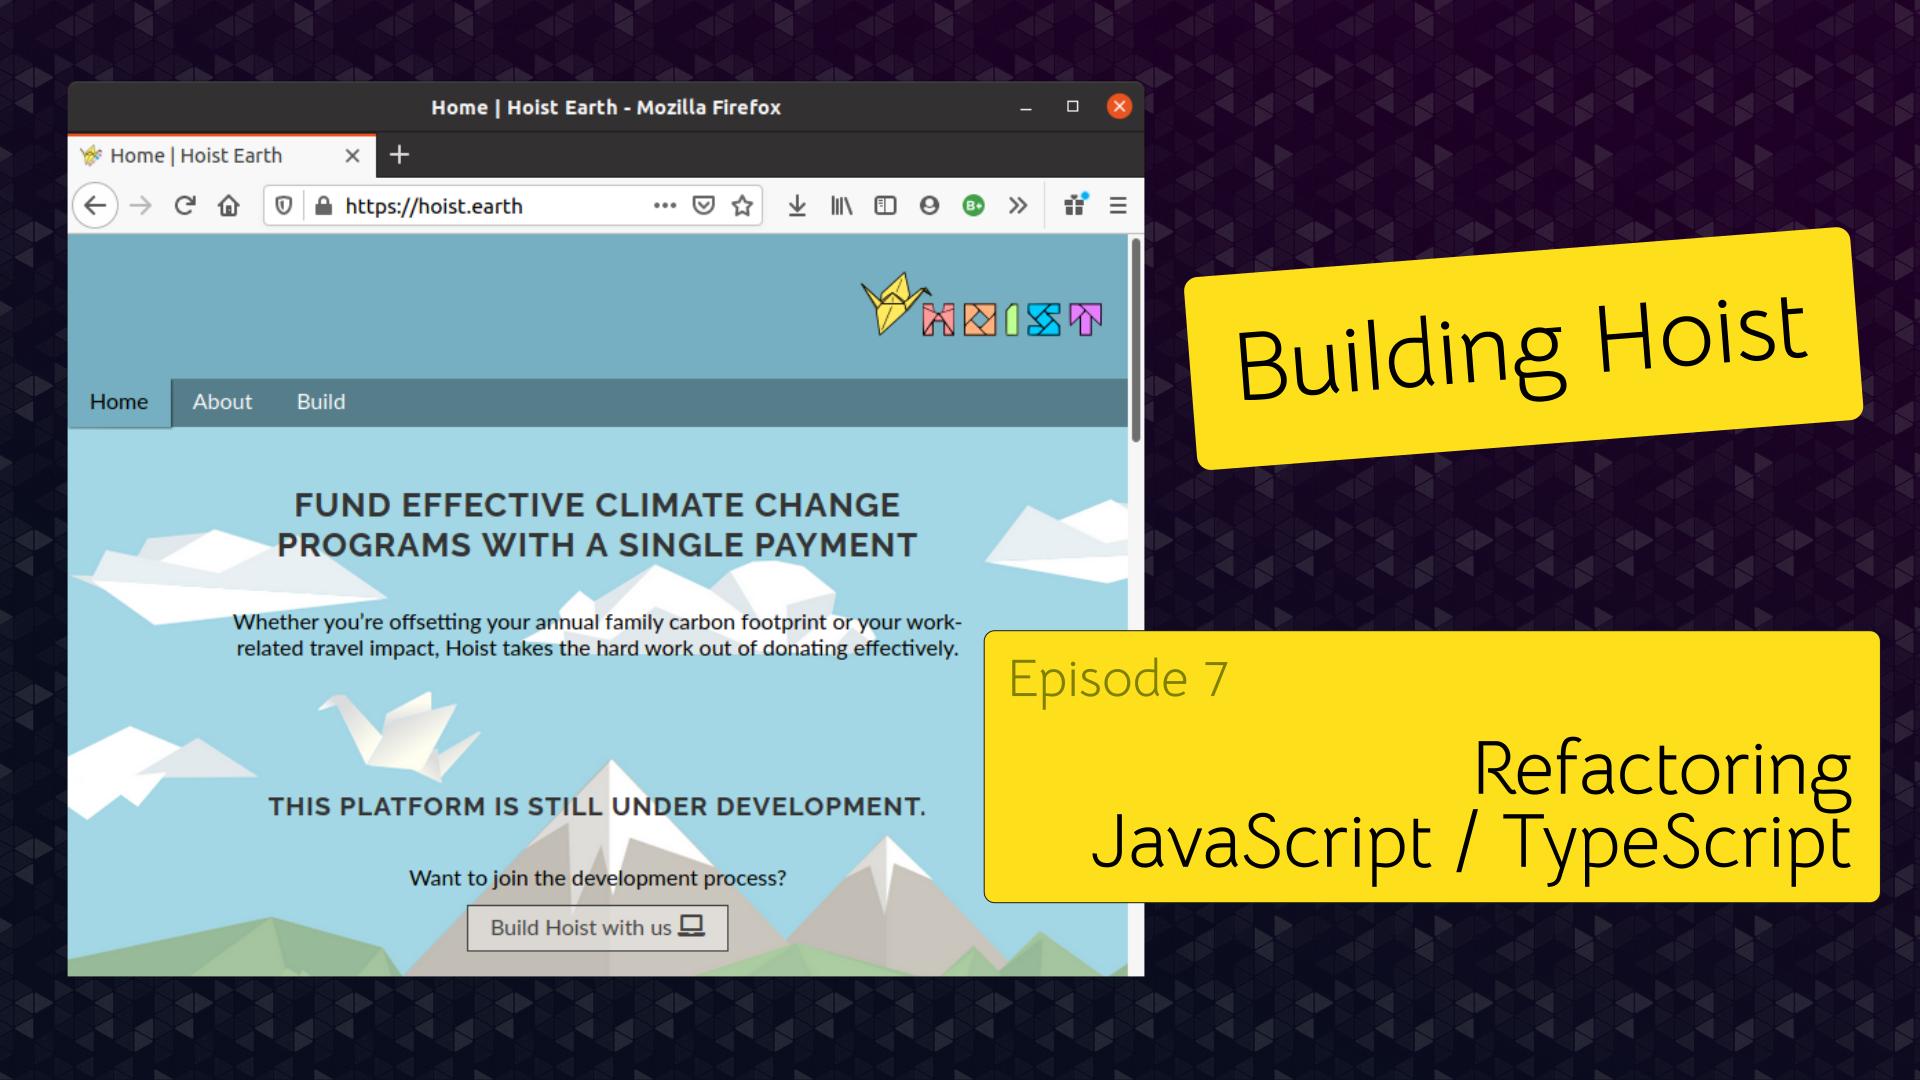 Episode null - Refactoring JavaScript / TypeScript